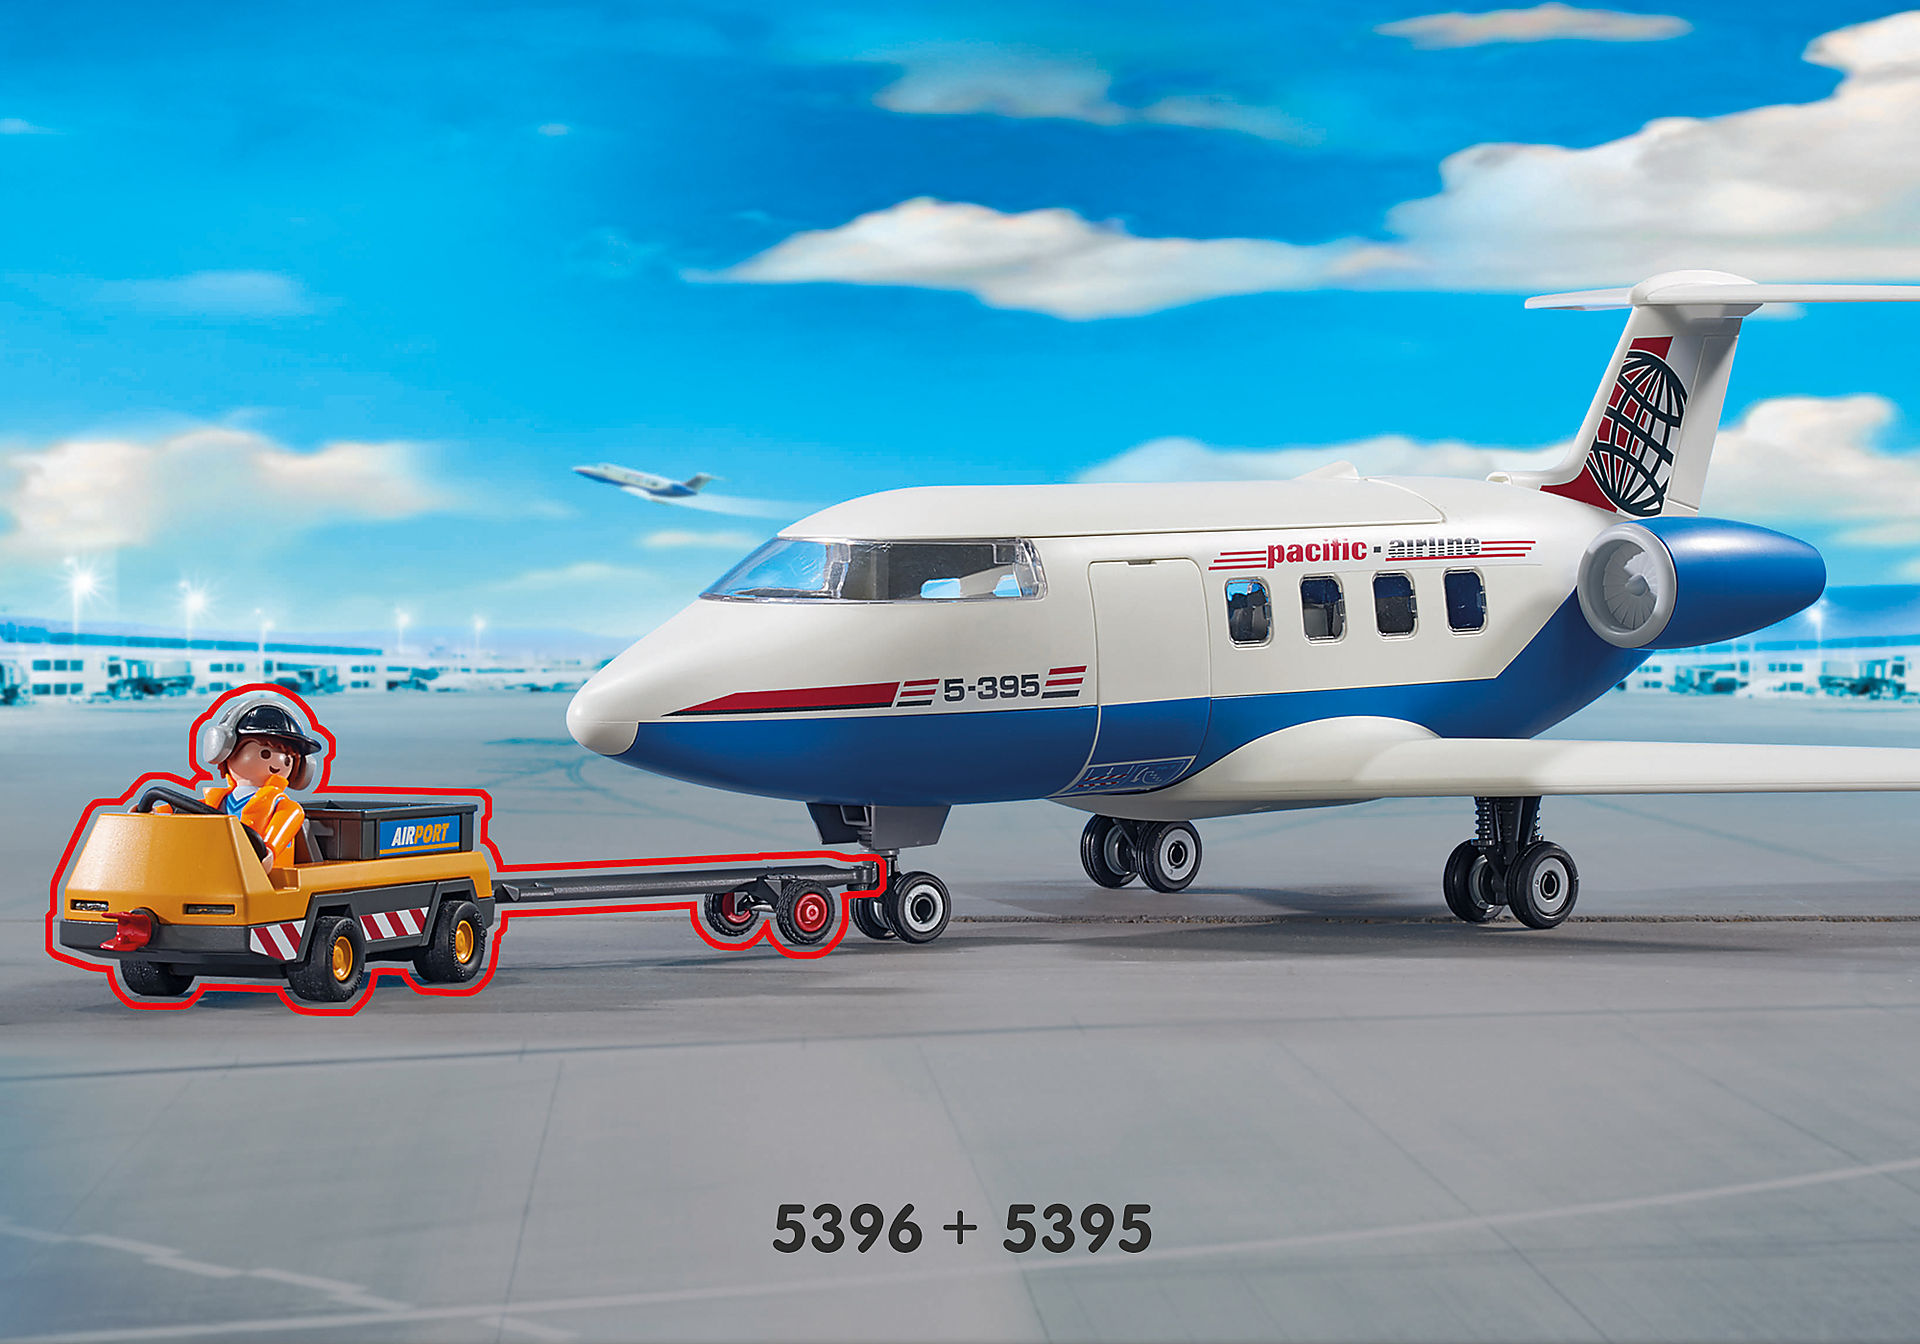 5396 Luchtverkeersleiders met bagagetransport zoom image6